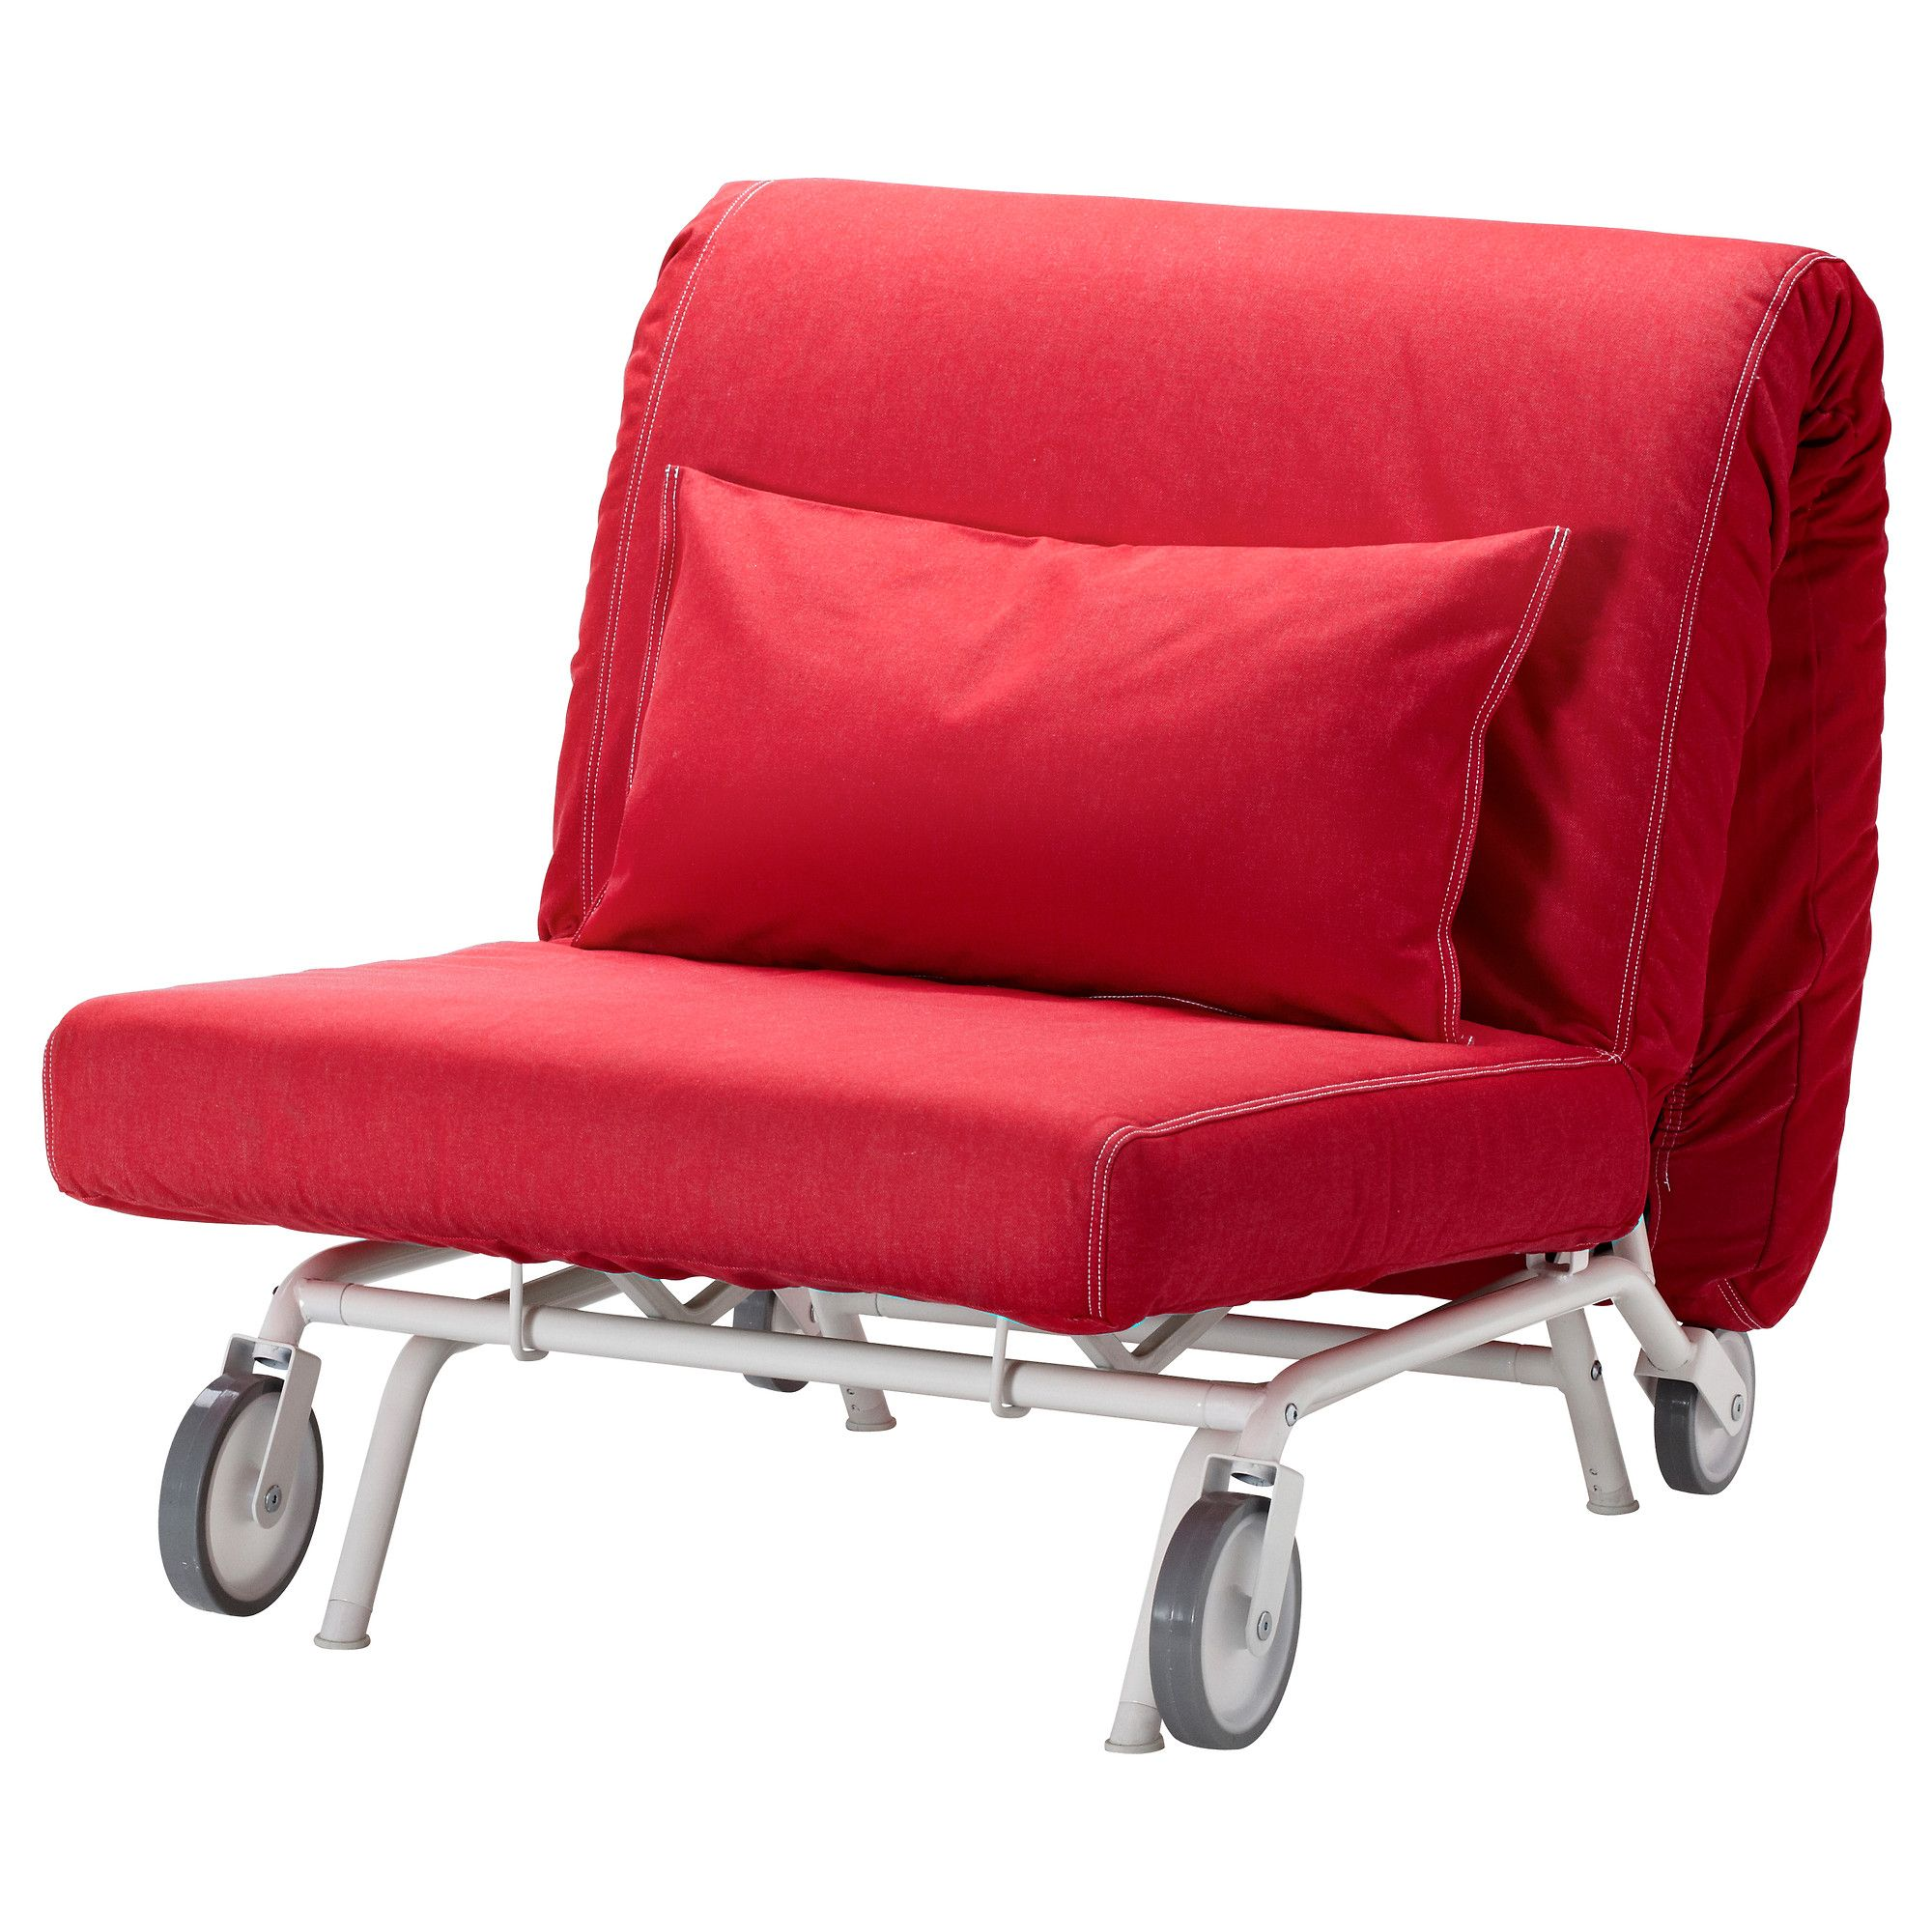 IKEA PS LVS Fauteuillit Vansta rouge IKEA meubles a